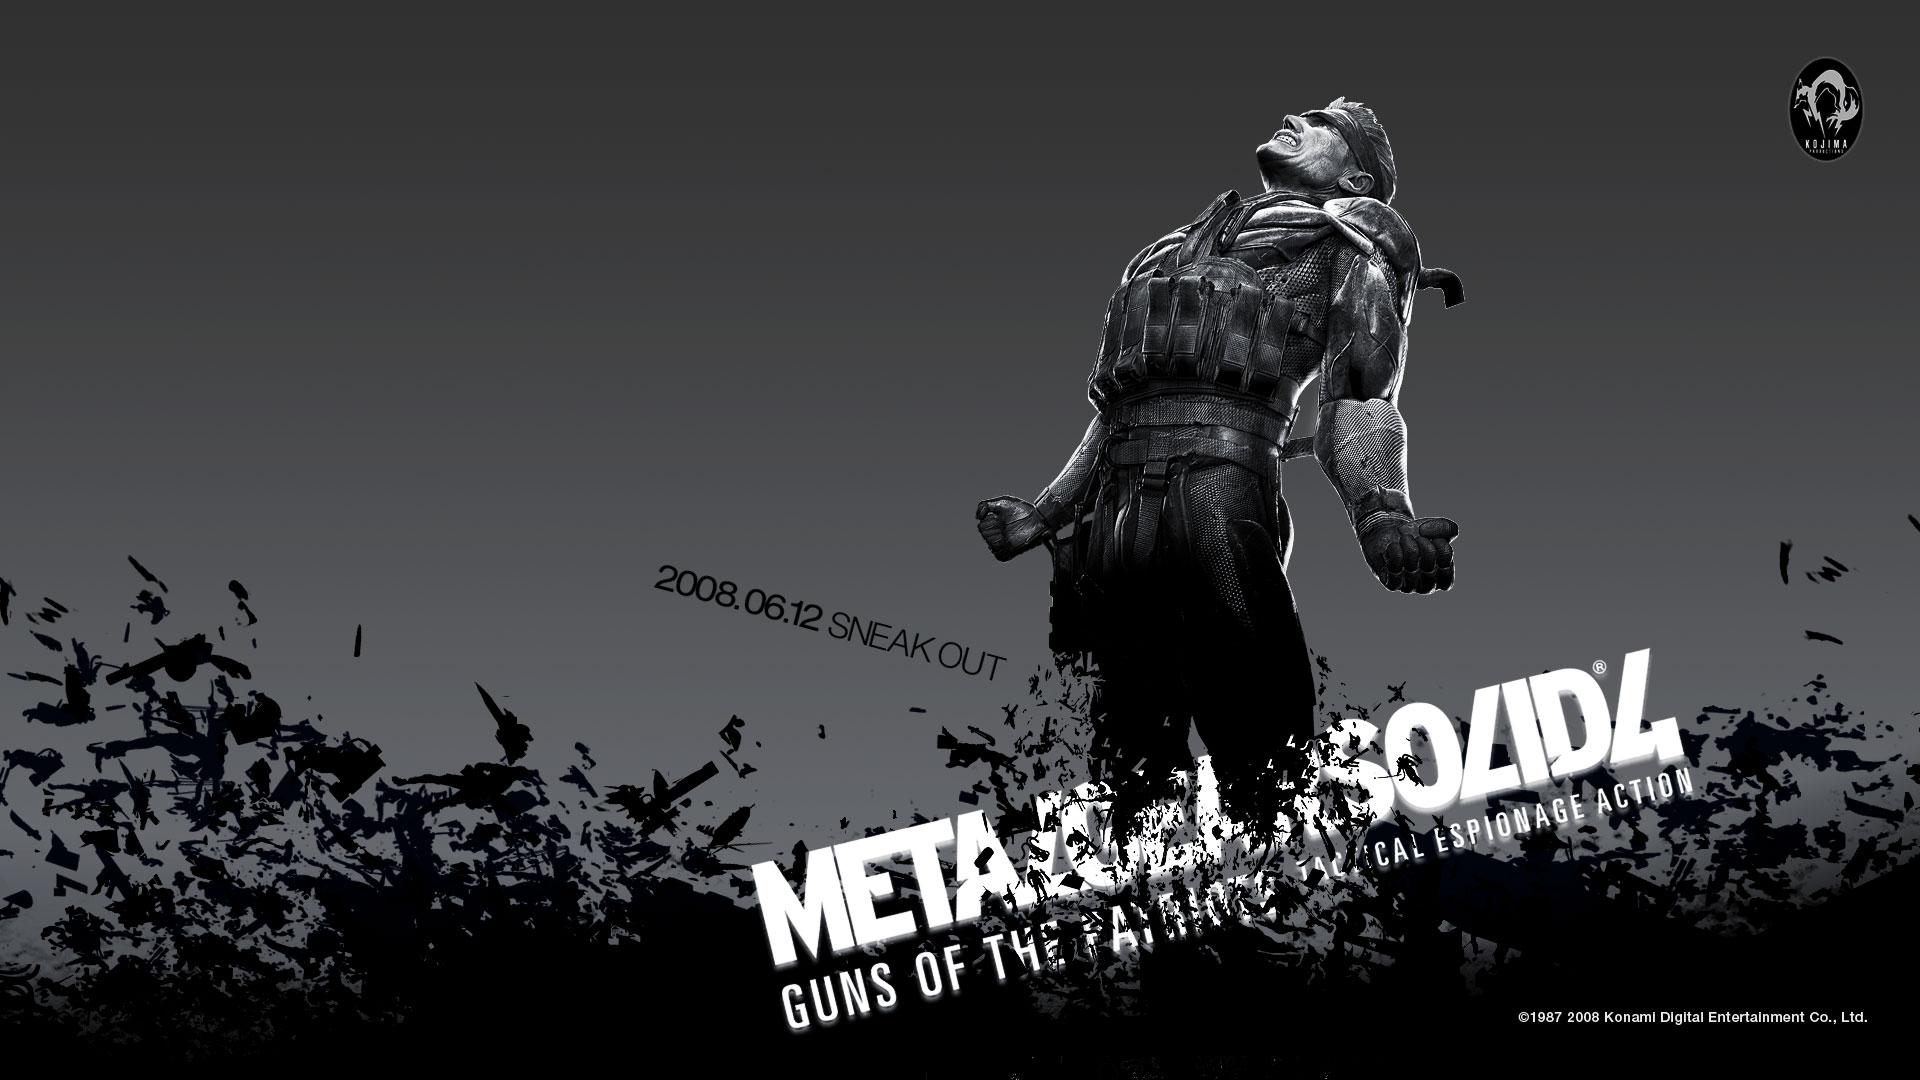 46 Metal Gear Solid 3 Wallpaper On Wallpapersafari